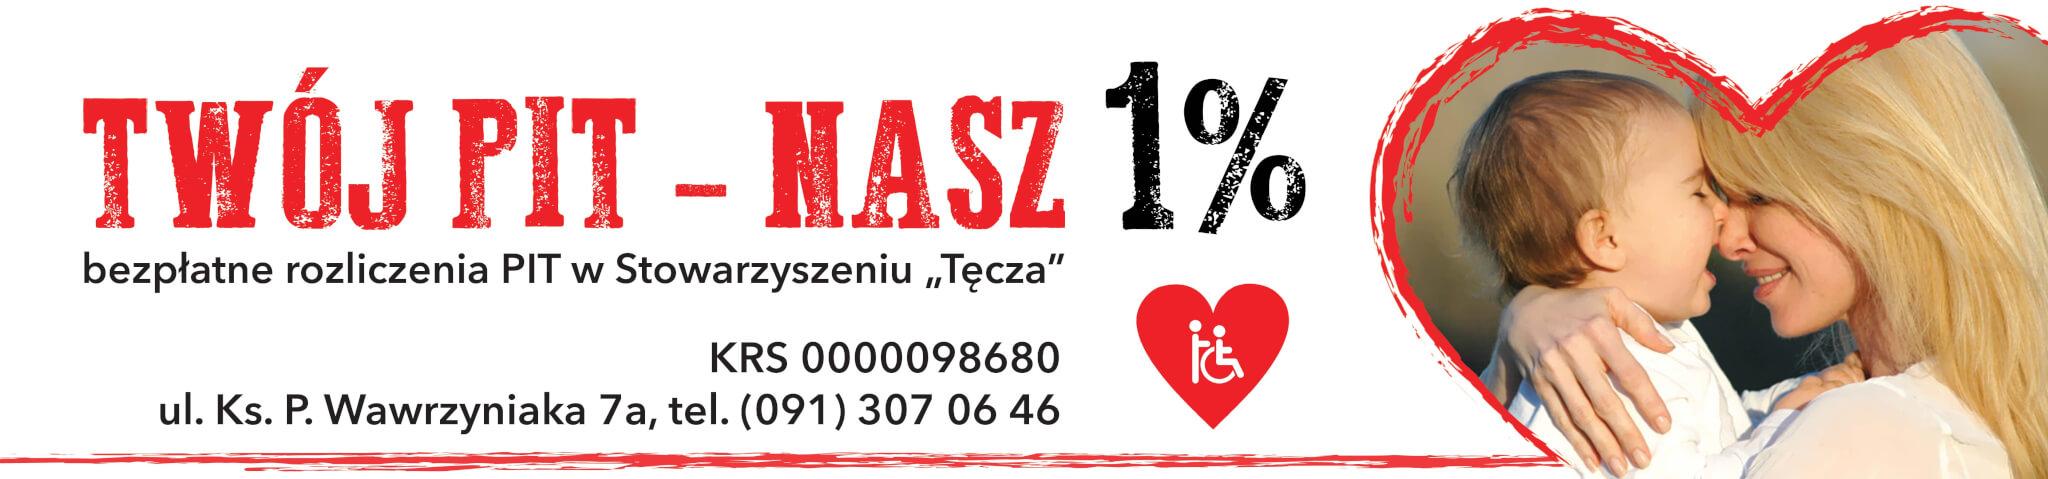 baner 1%_ostateczny - Kopia